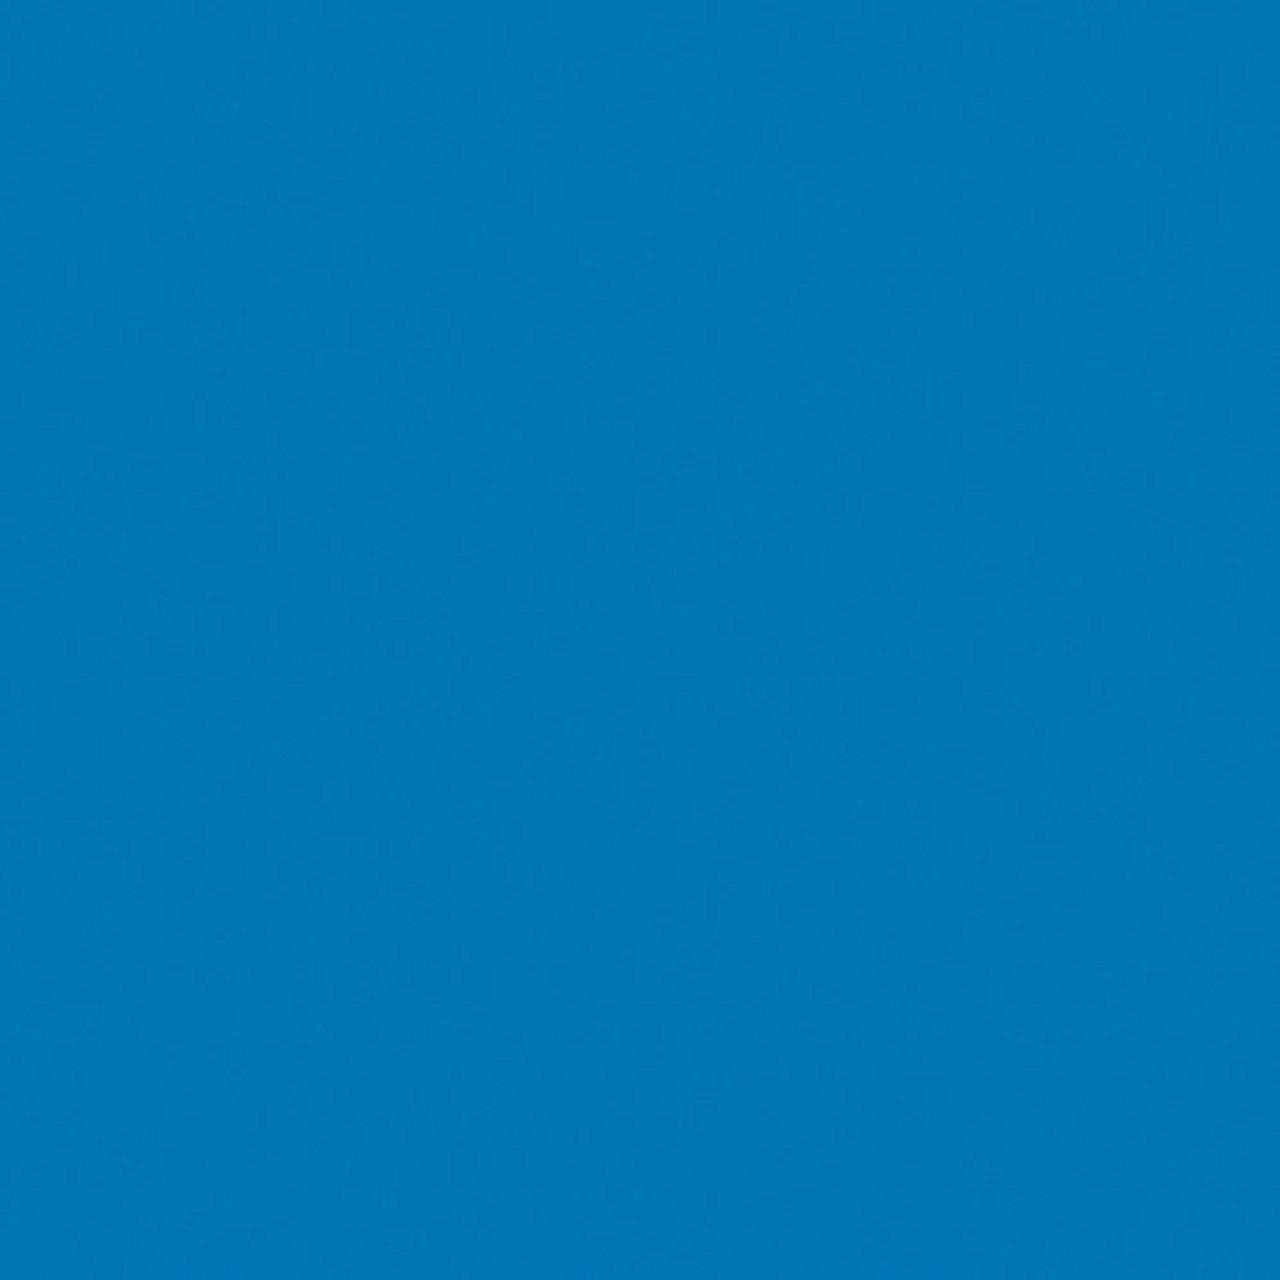 "#0081 Rosco Gels Roscolux Urban Blue, 20x24"""